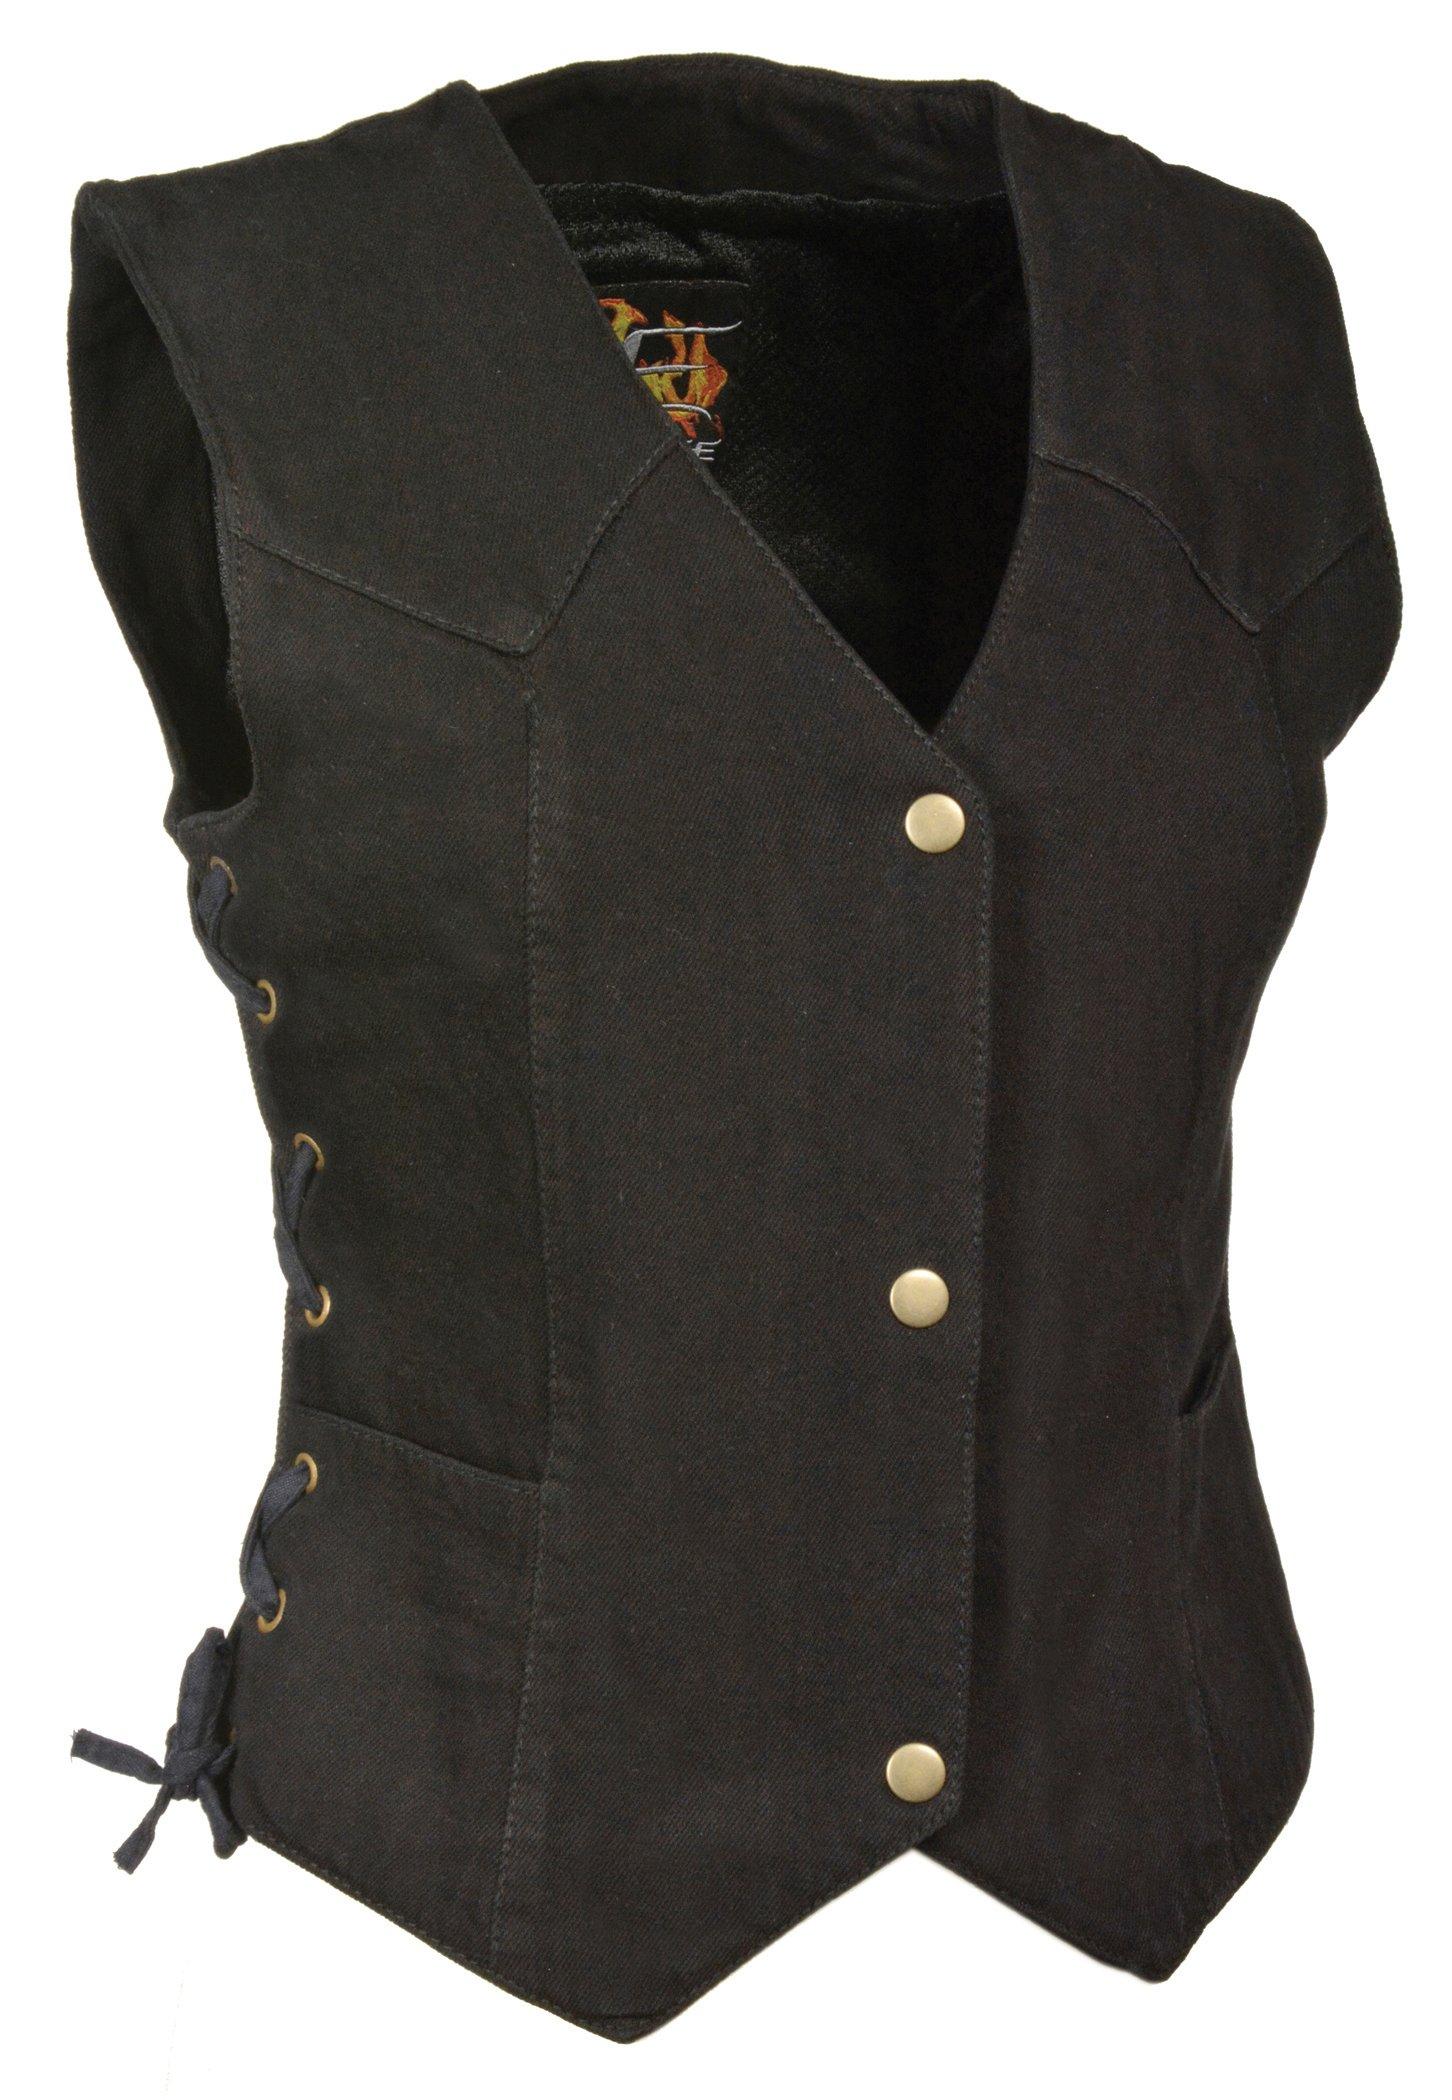 Milwaukee Performance Women's Denim 3 Front Snaps Vest (Black, X-Large) (14/12 OZ DEN)